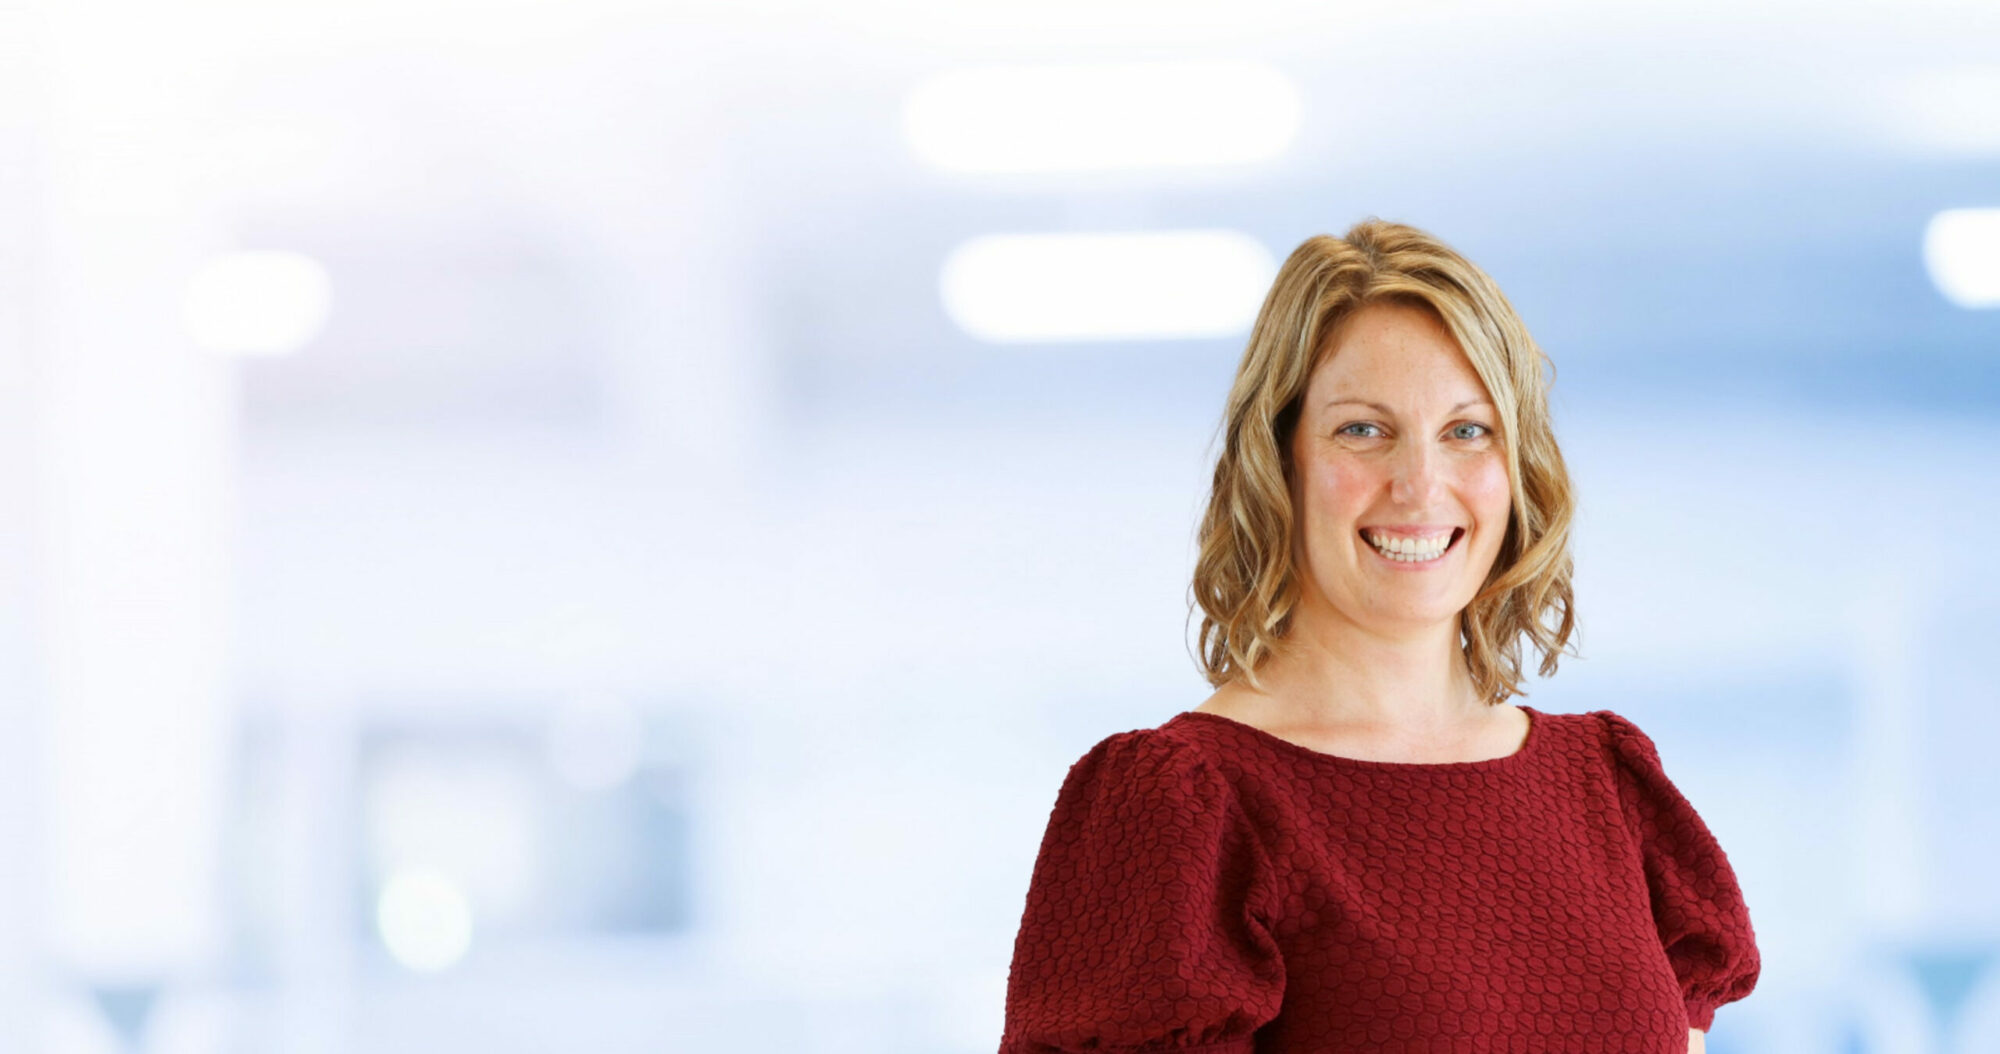 Courtney Steele physiotherapist Cornerstone Physiotherapy North York